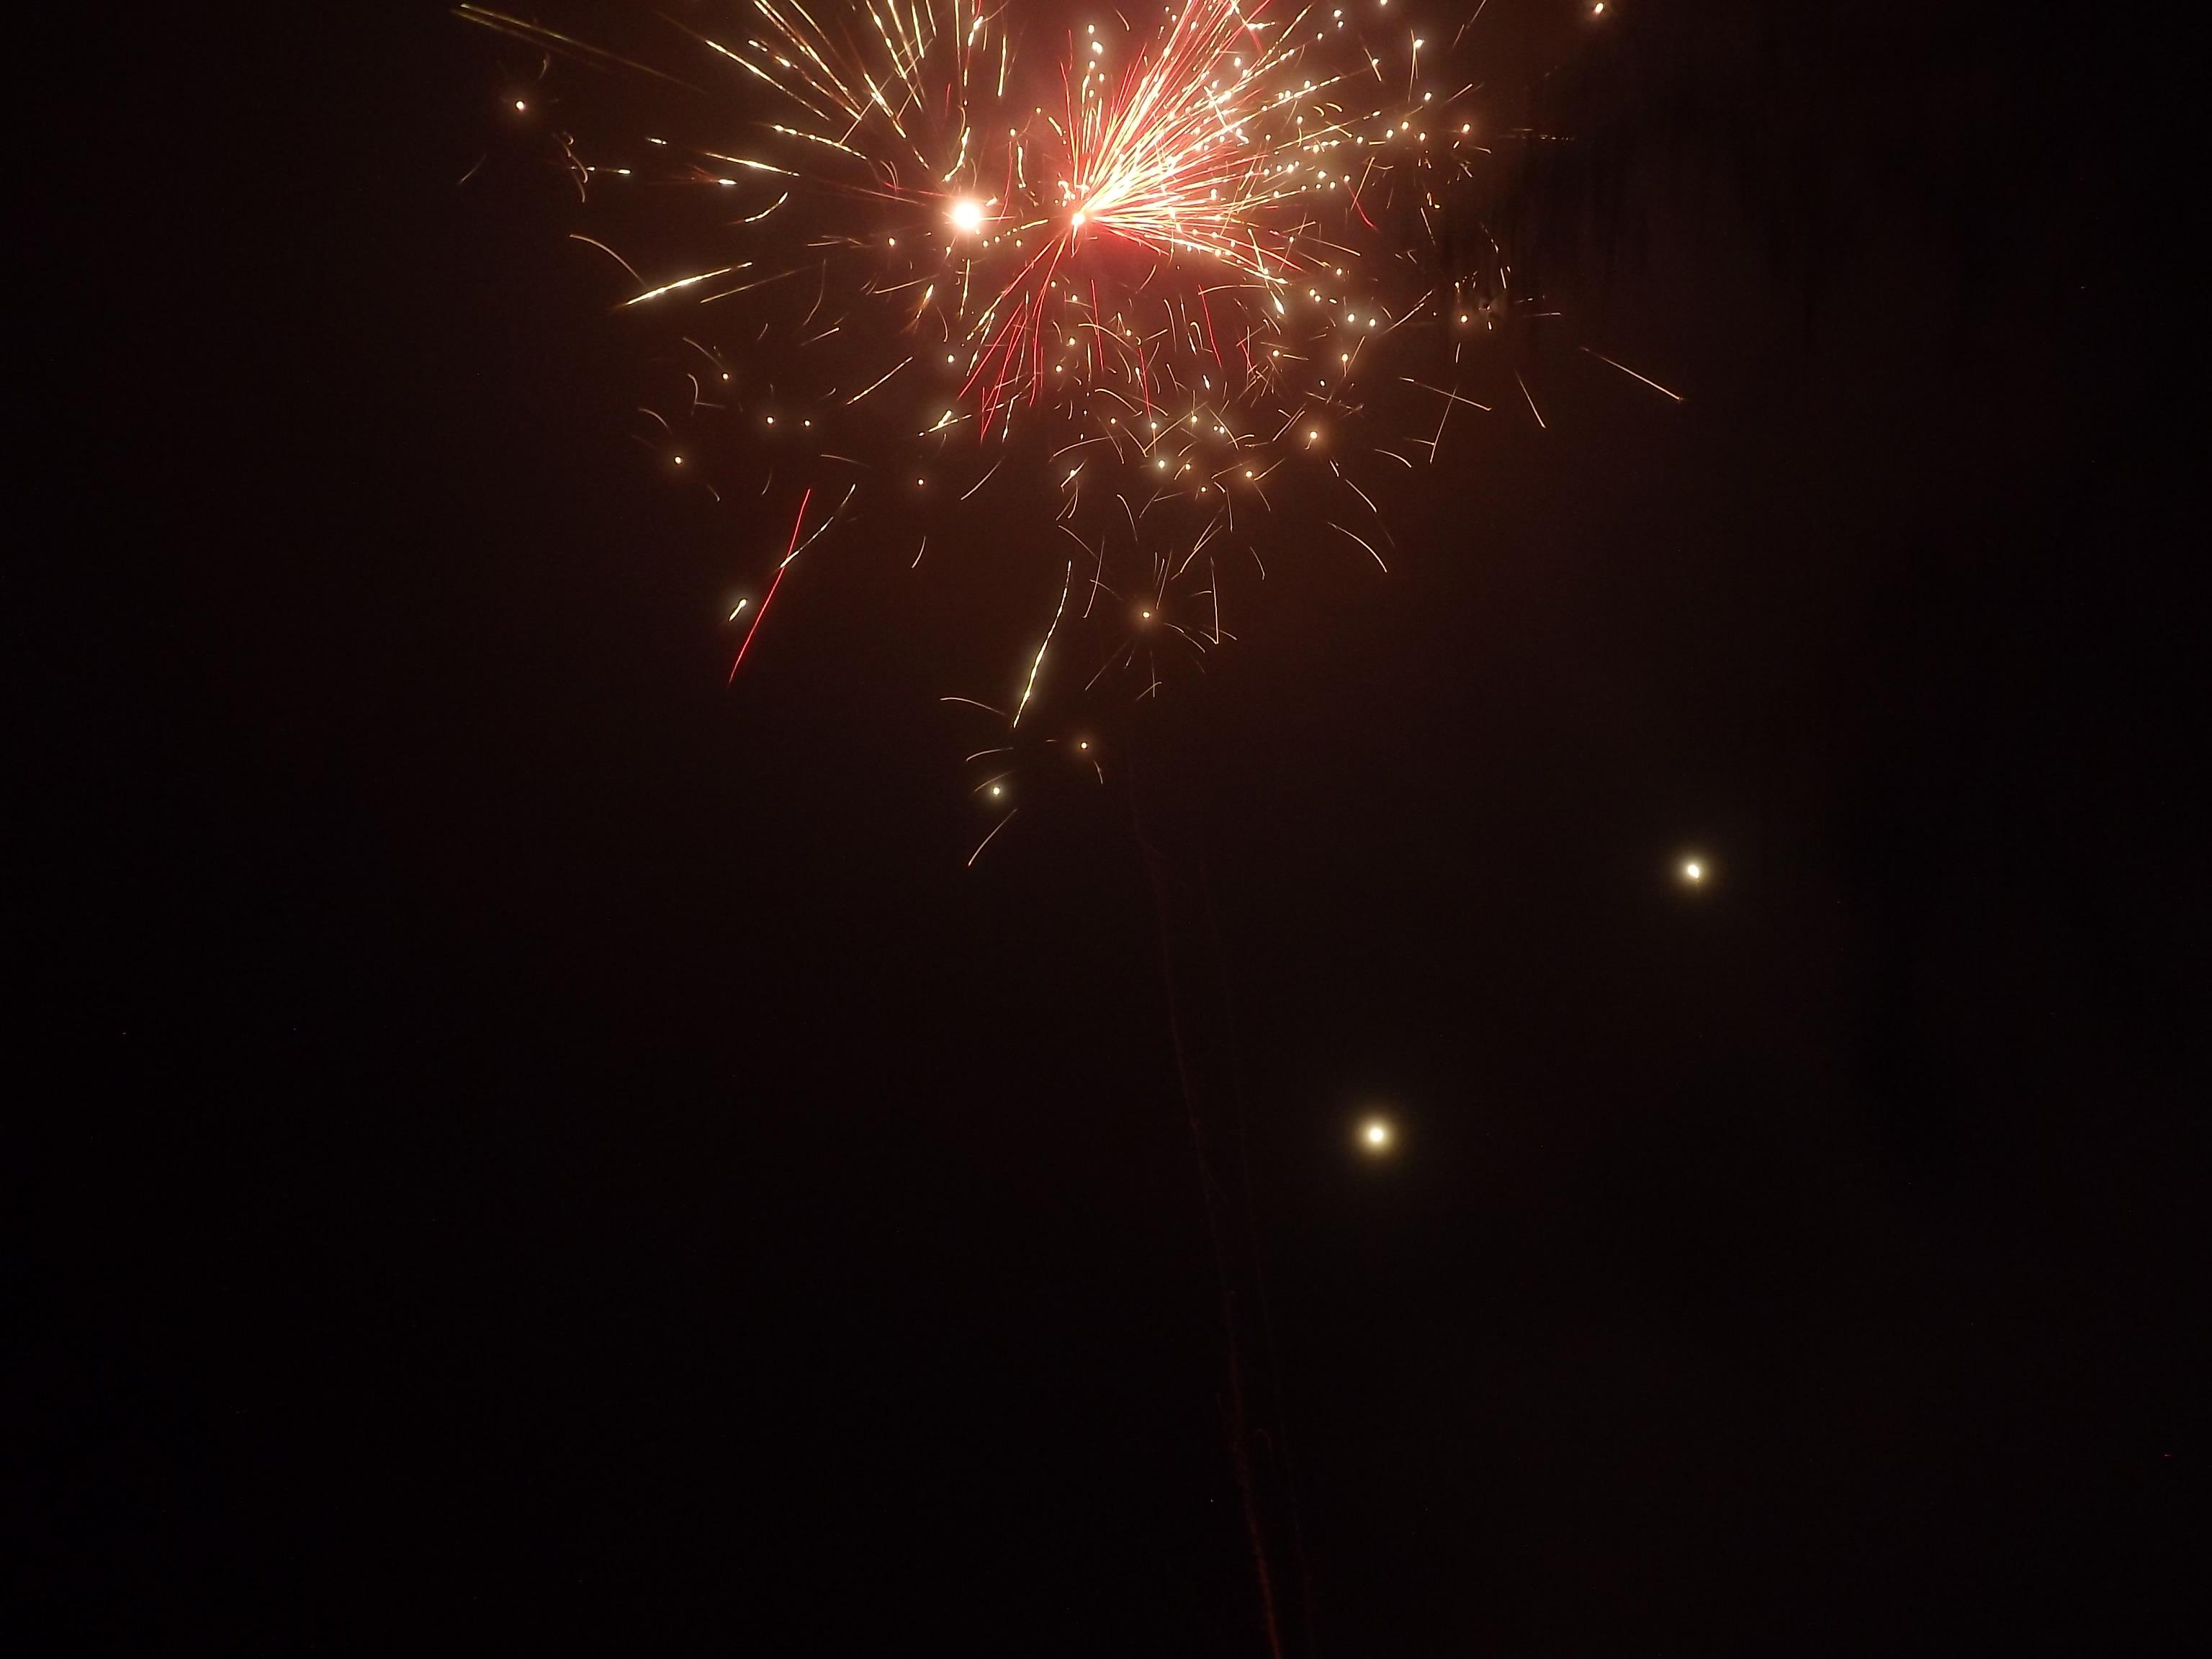 9039-bombe-feuerwerk-rot-gold